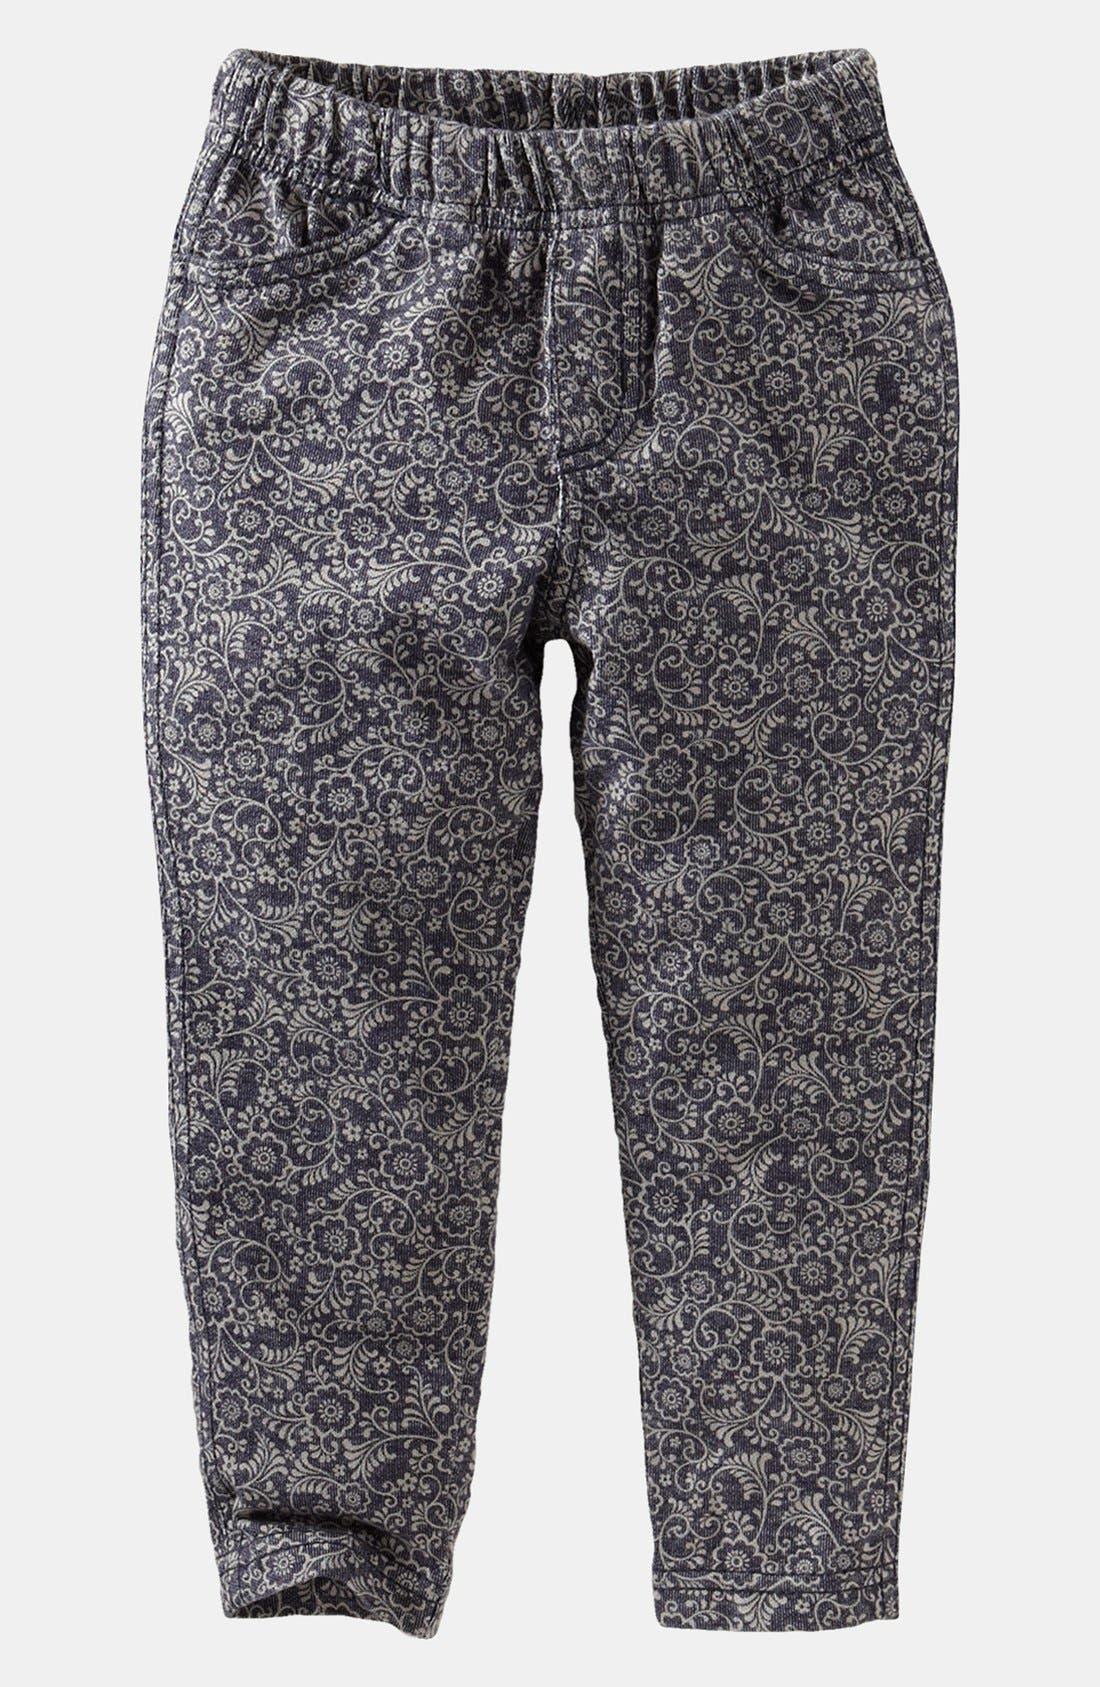 Main Image - Tea Collection Print Skinny Pants (Little Girls & Big Girls)